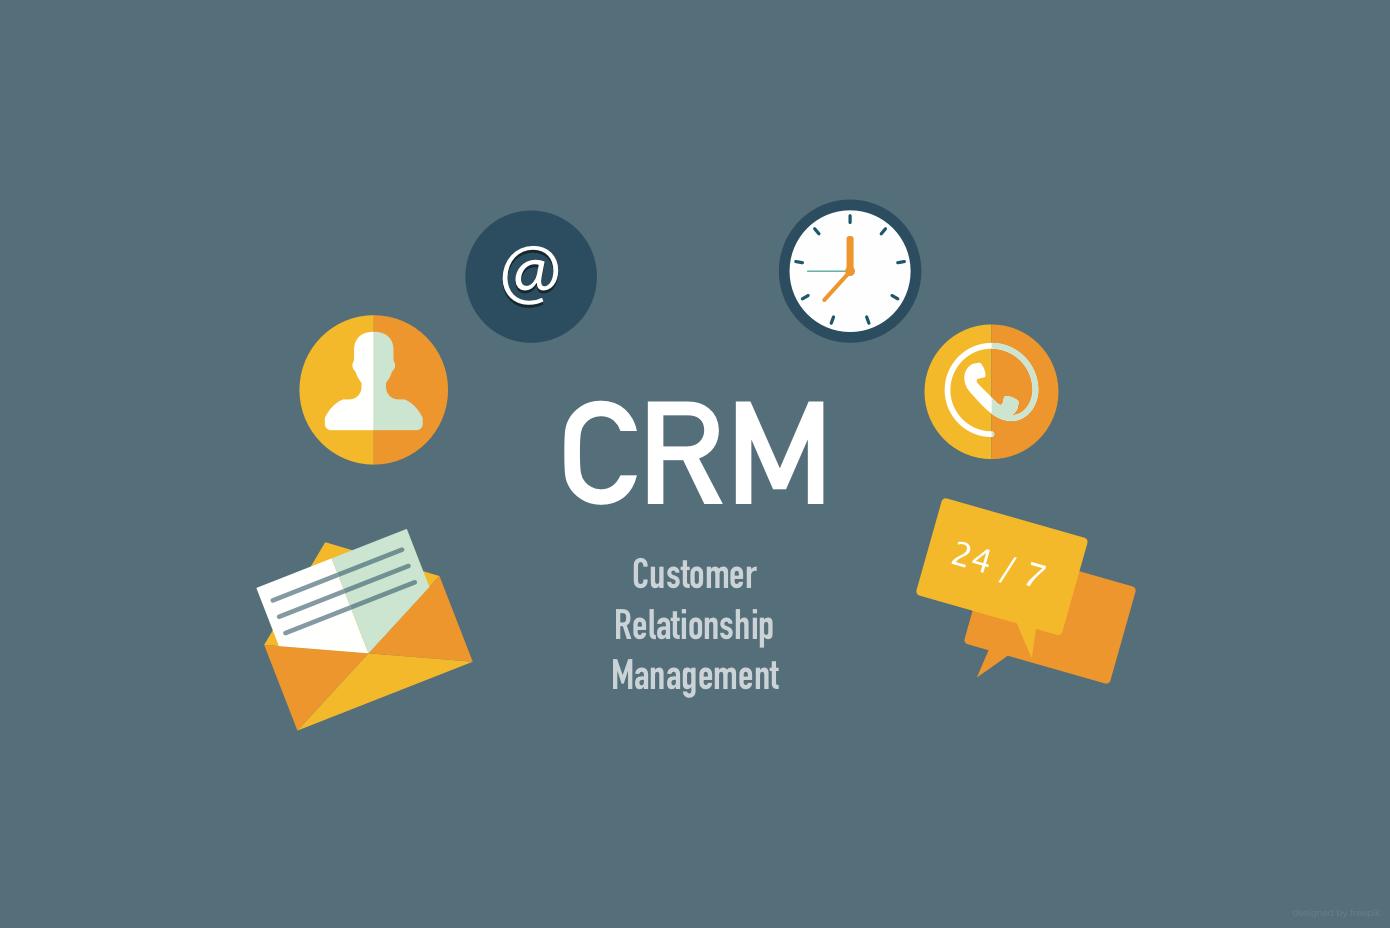 Customer Relationship Management (CRM) - How To Streamline